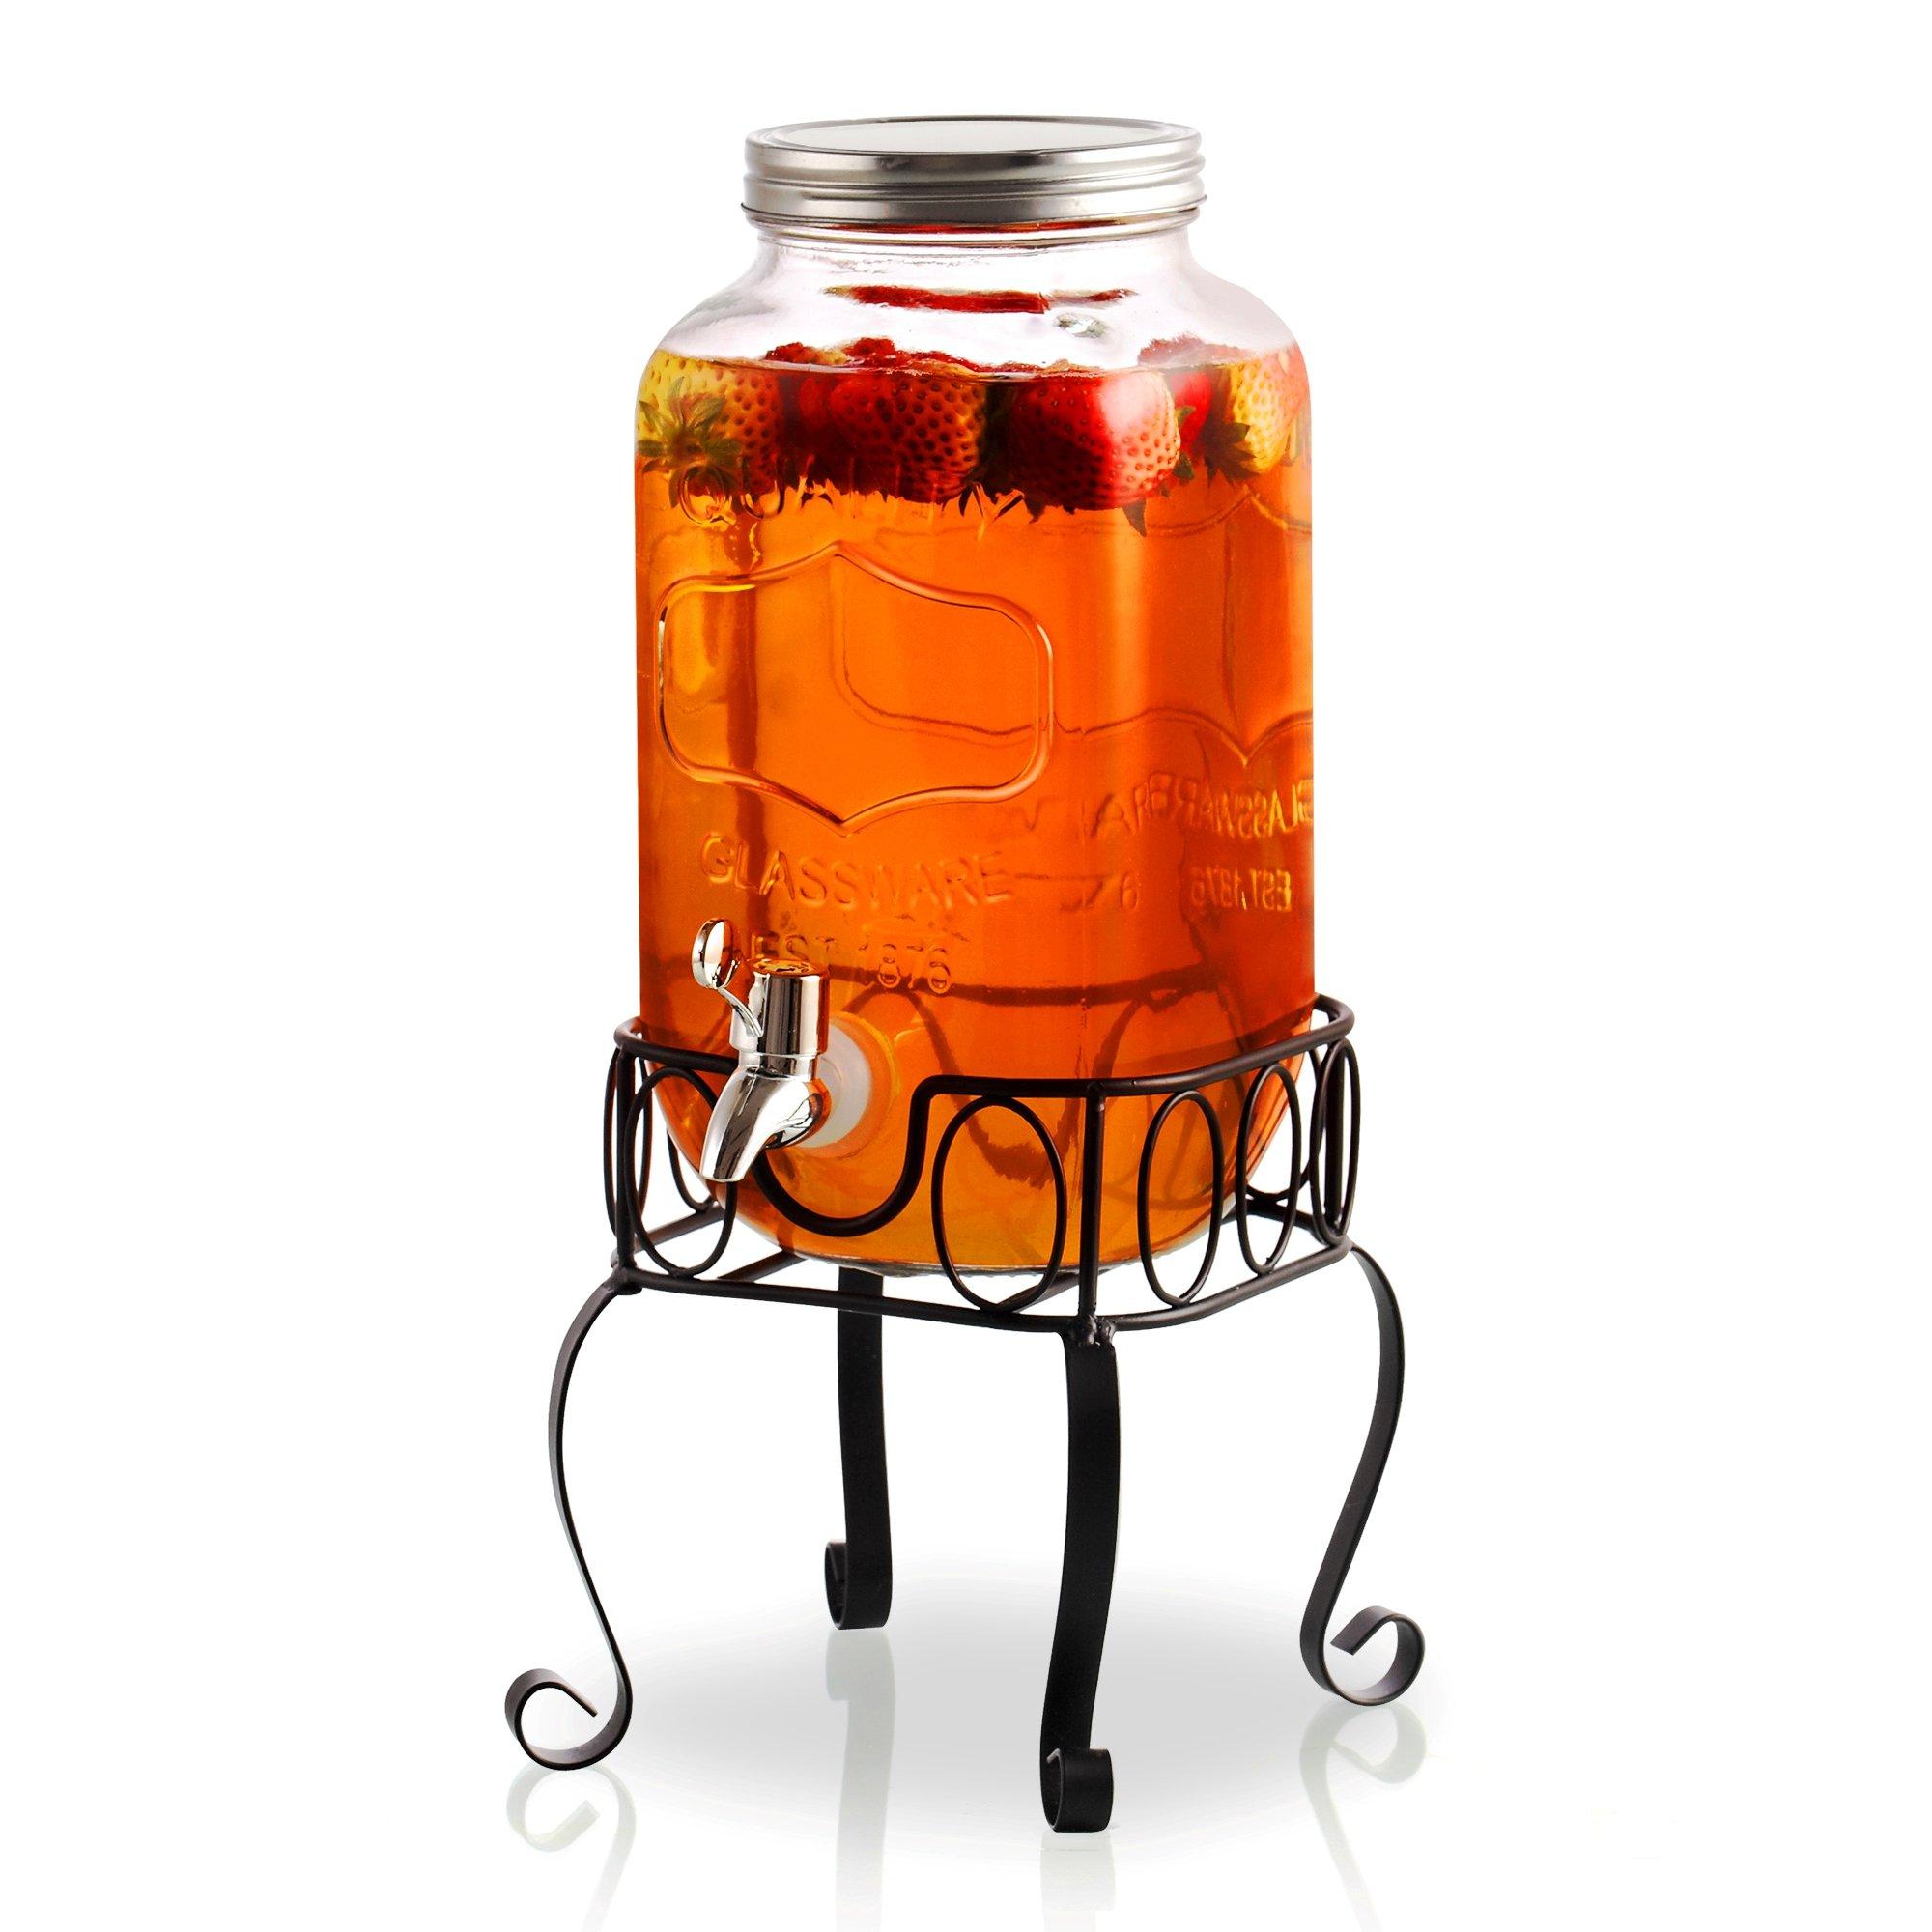 Cook N Home 02578 Cold Beverage Dispenser, 1 gallon, Clear